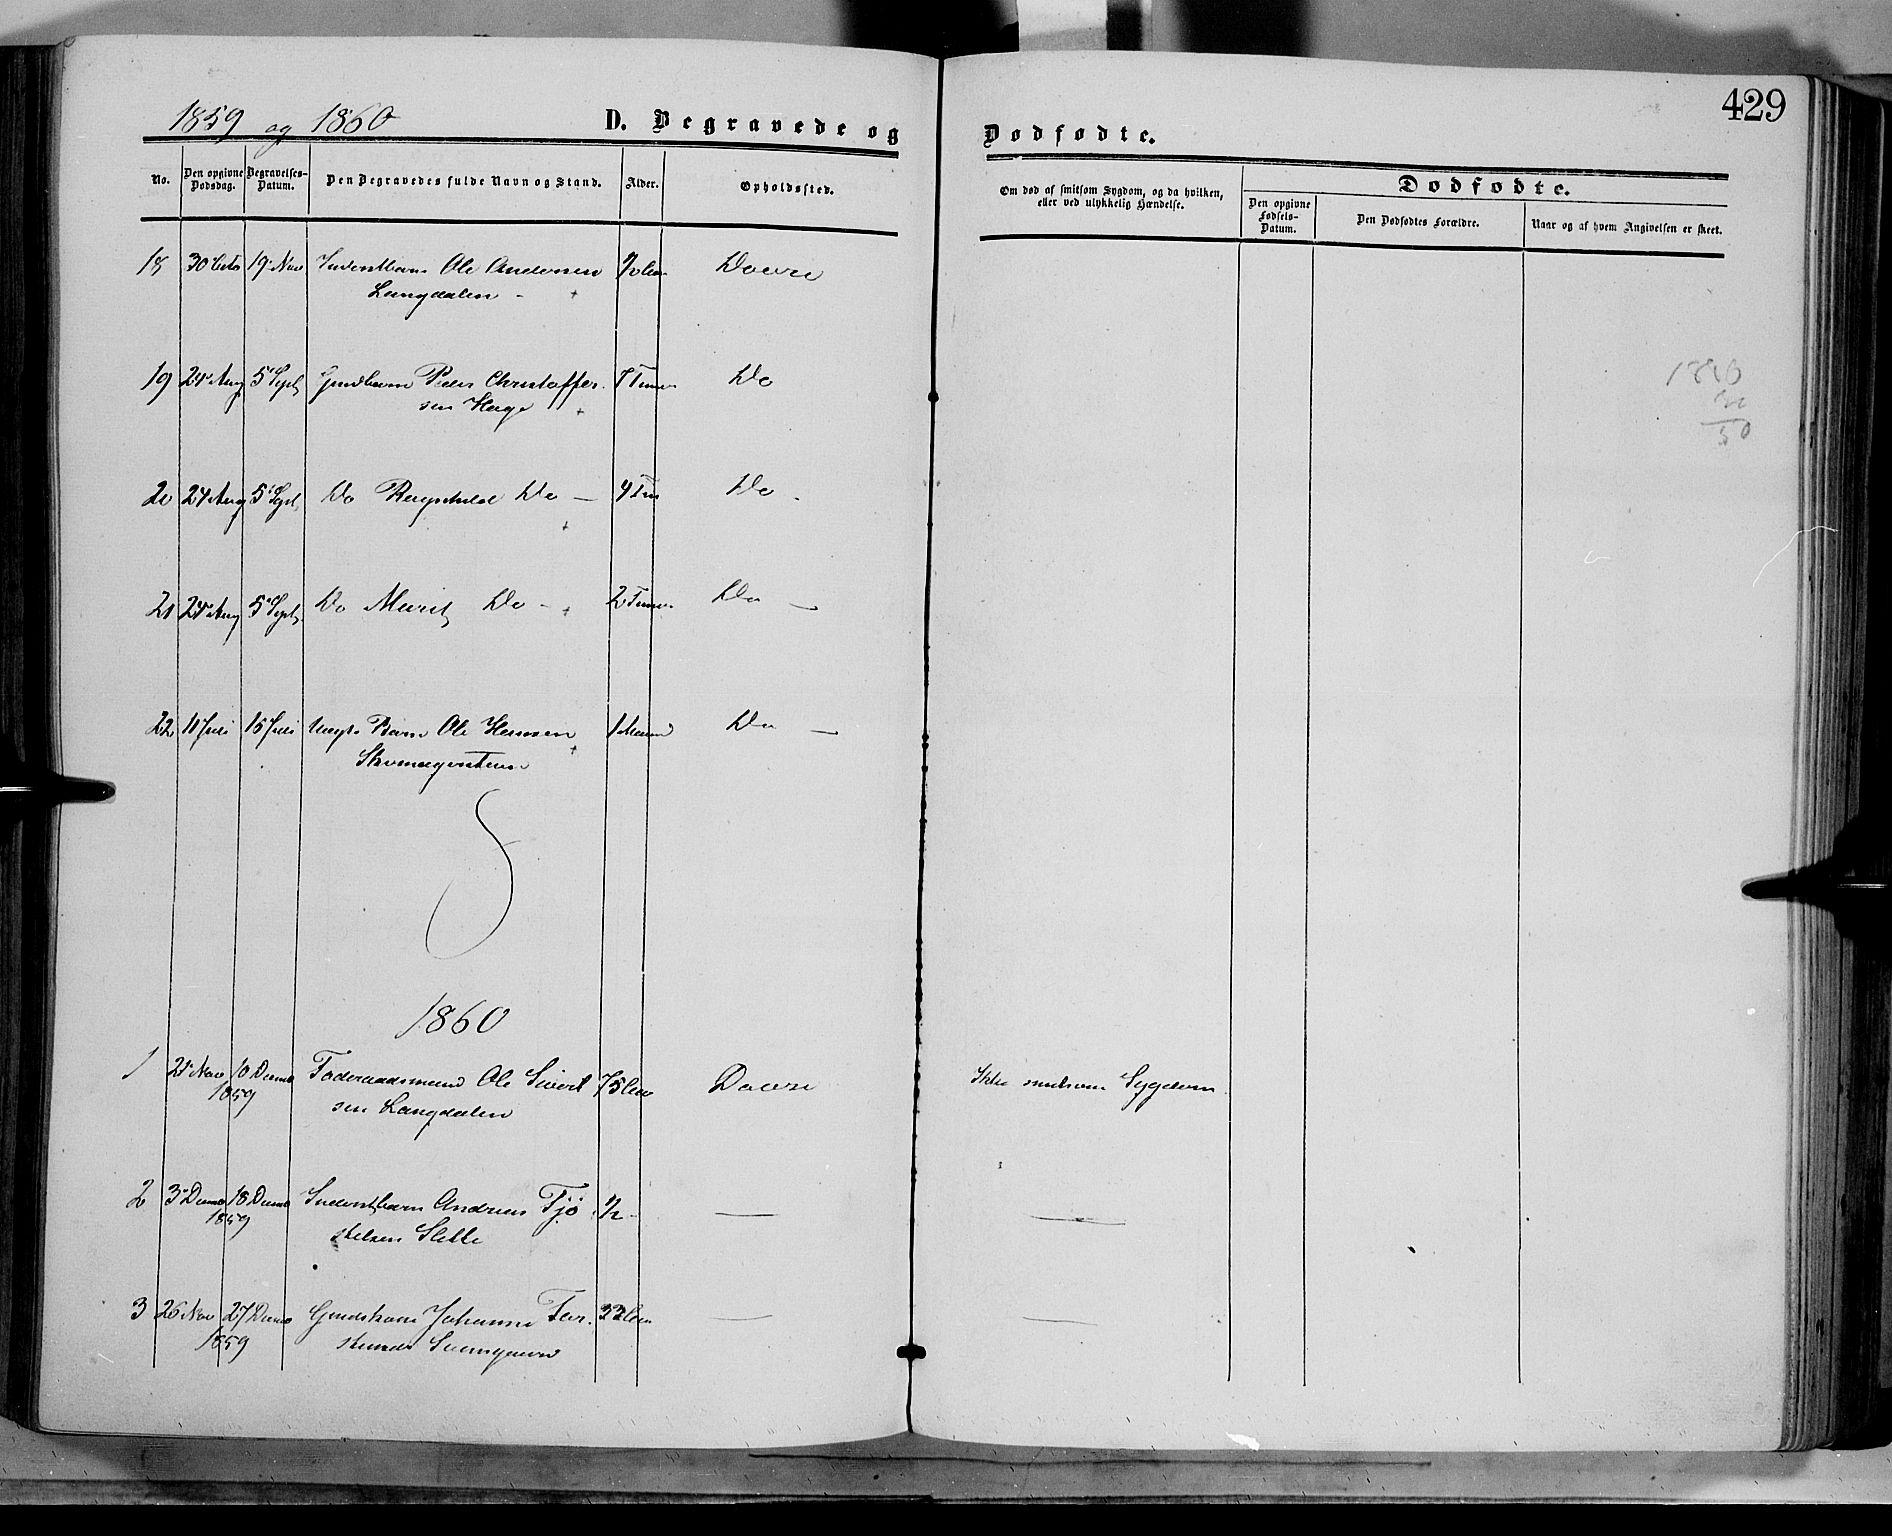 SAH, Dovre prestekontor, Ministerialbok nr. 1, 1854-1878, s. 429